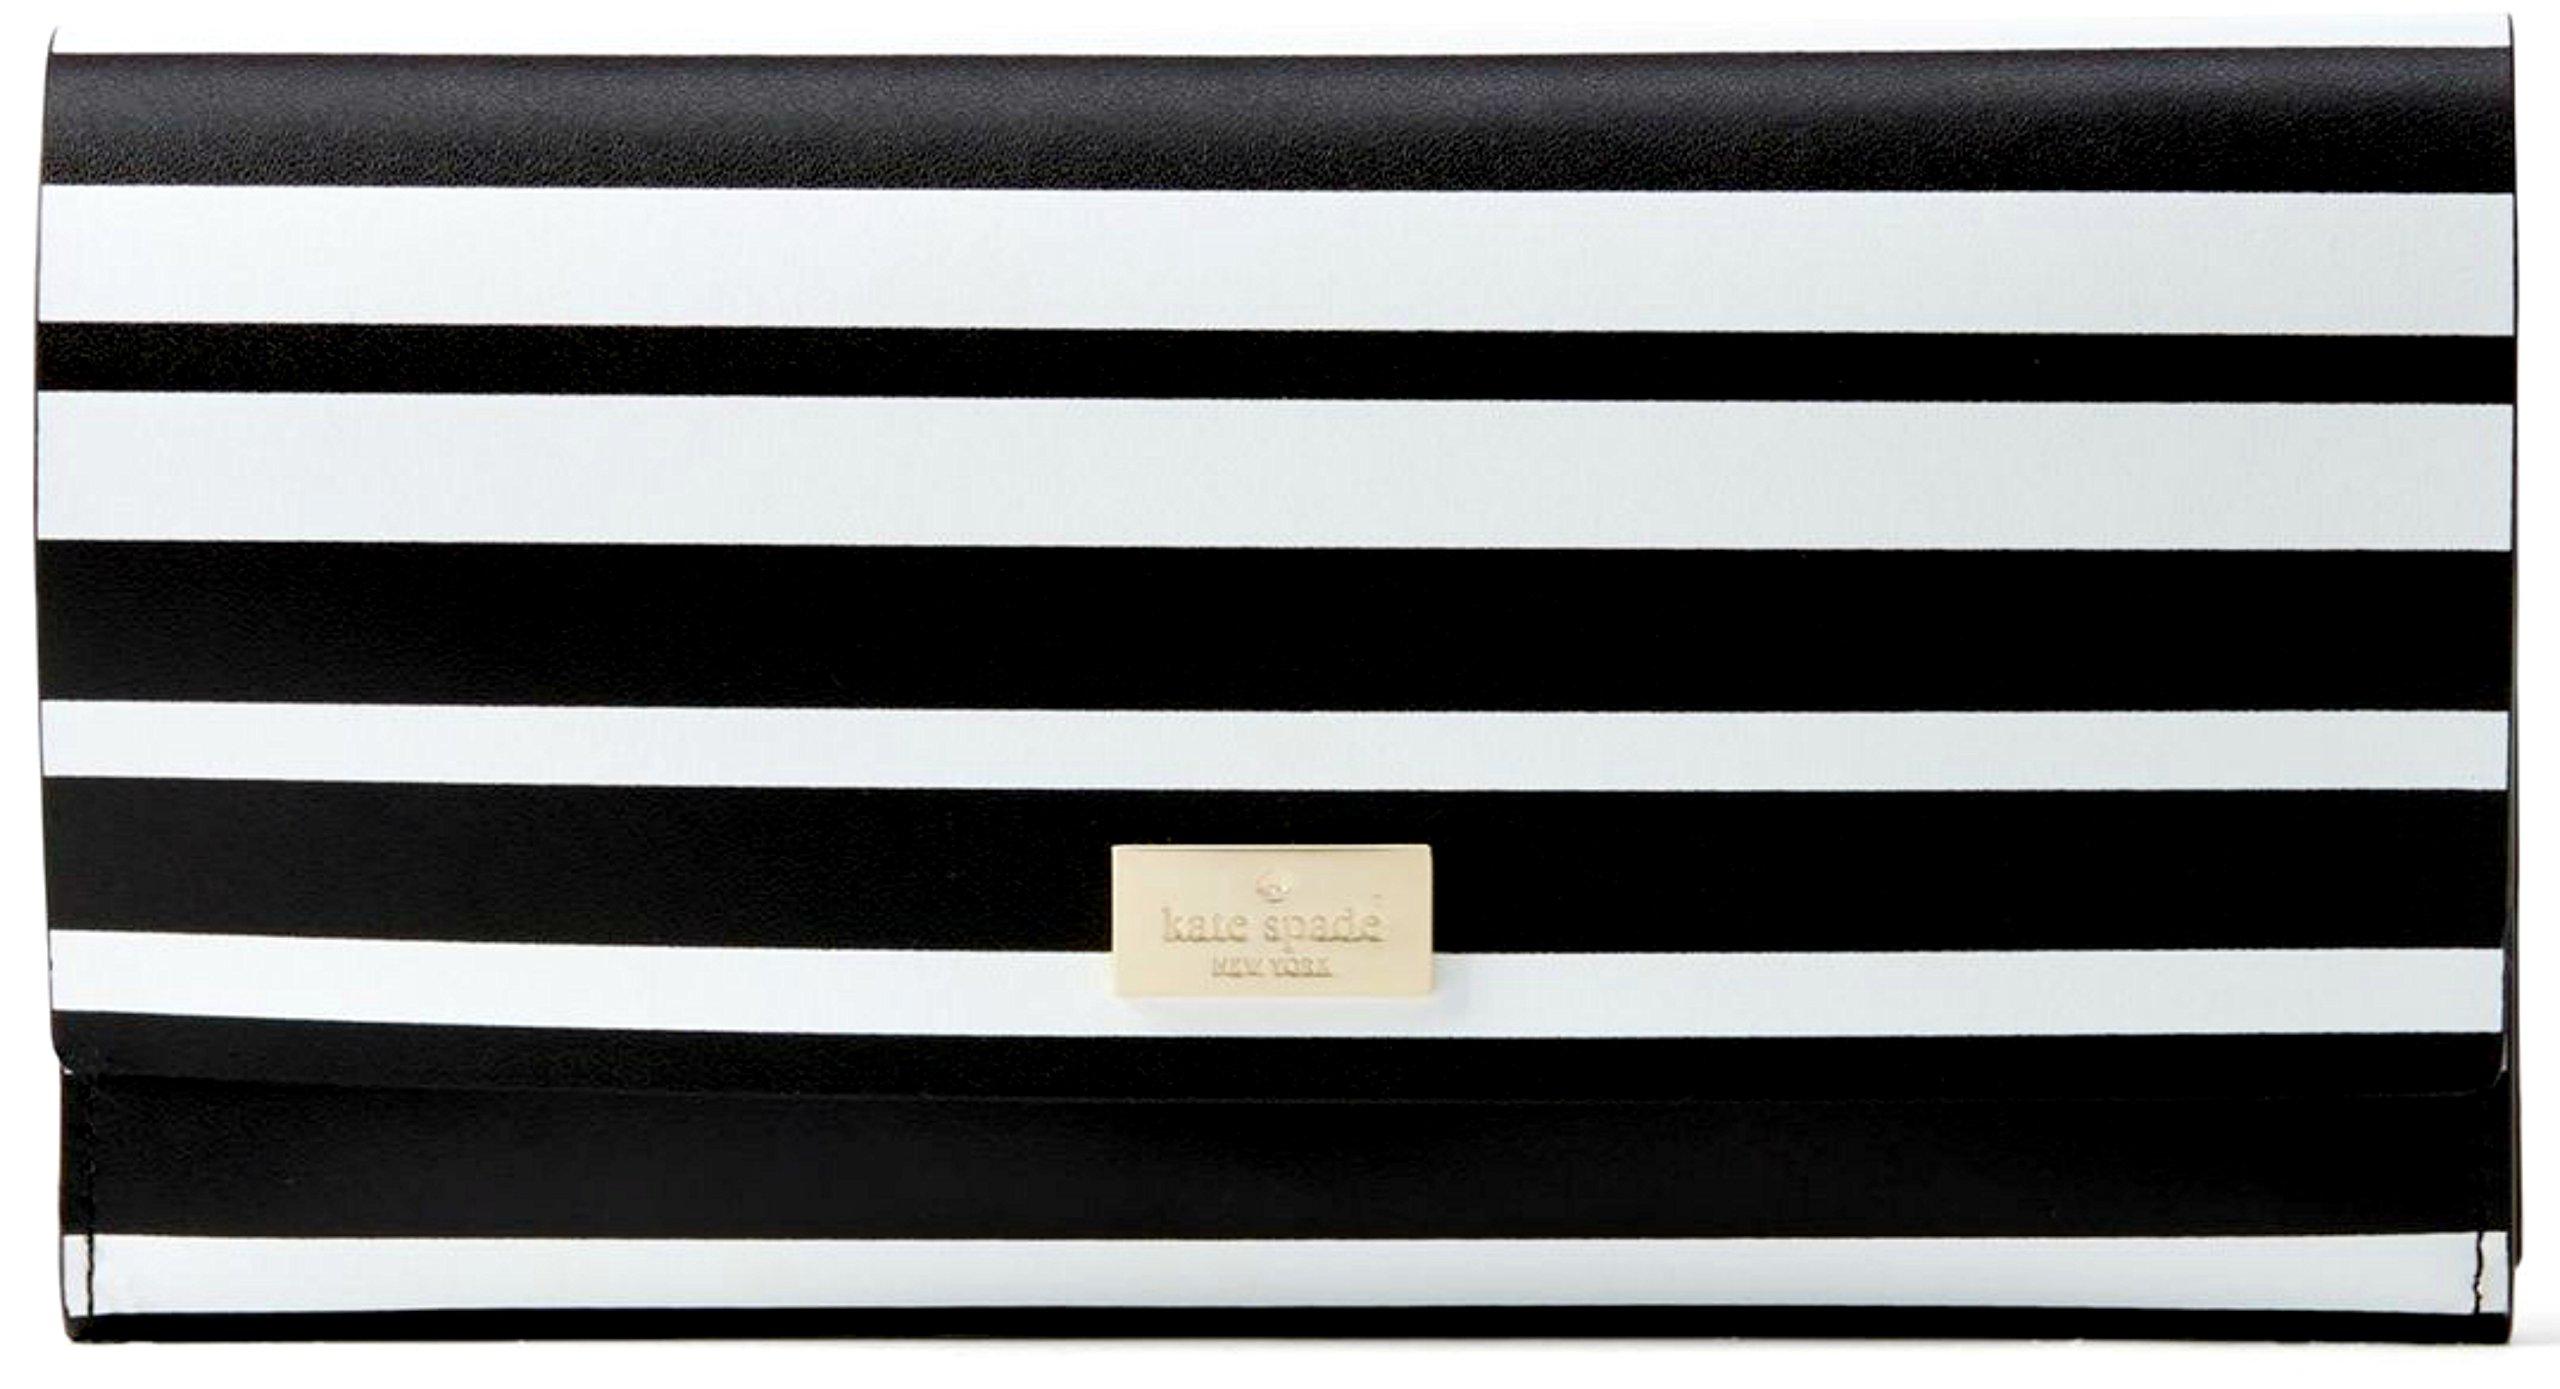 Kate Spade Putnam Drive Street Black & White Stripe Pim Leather Wallet